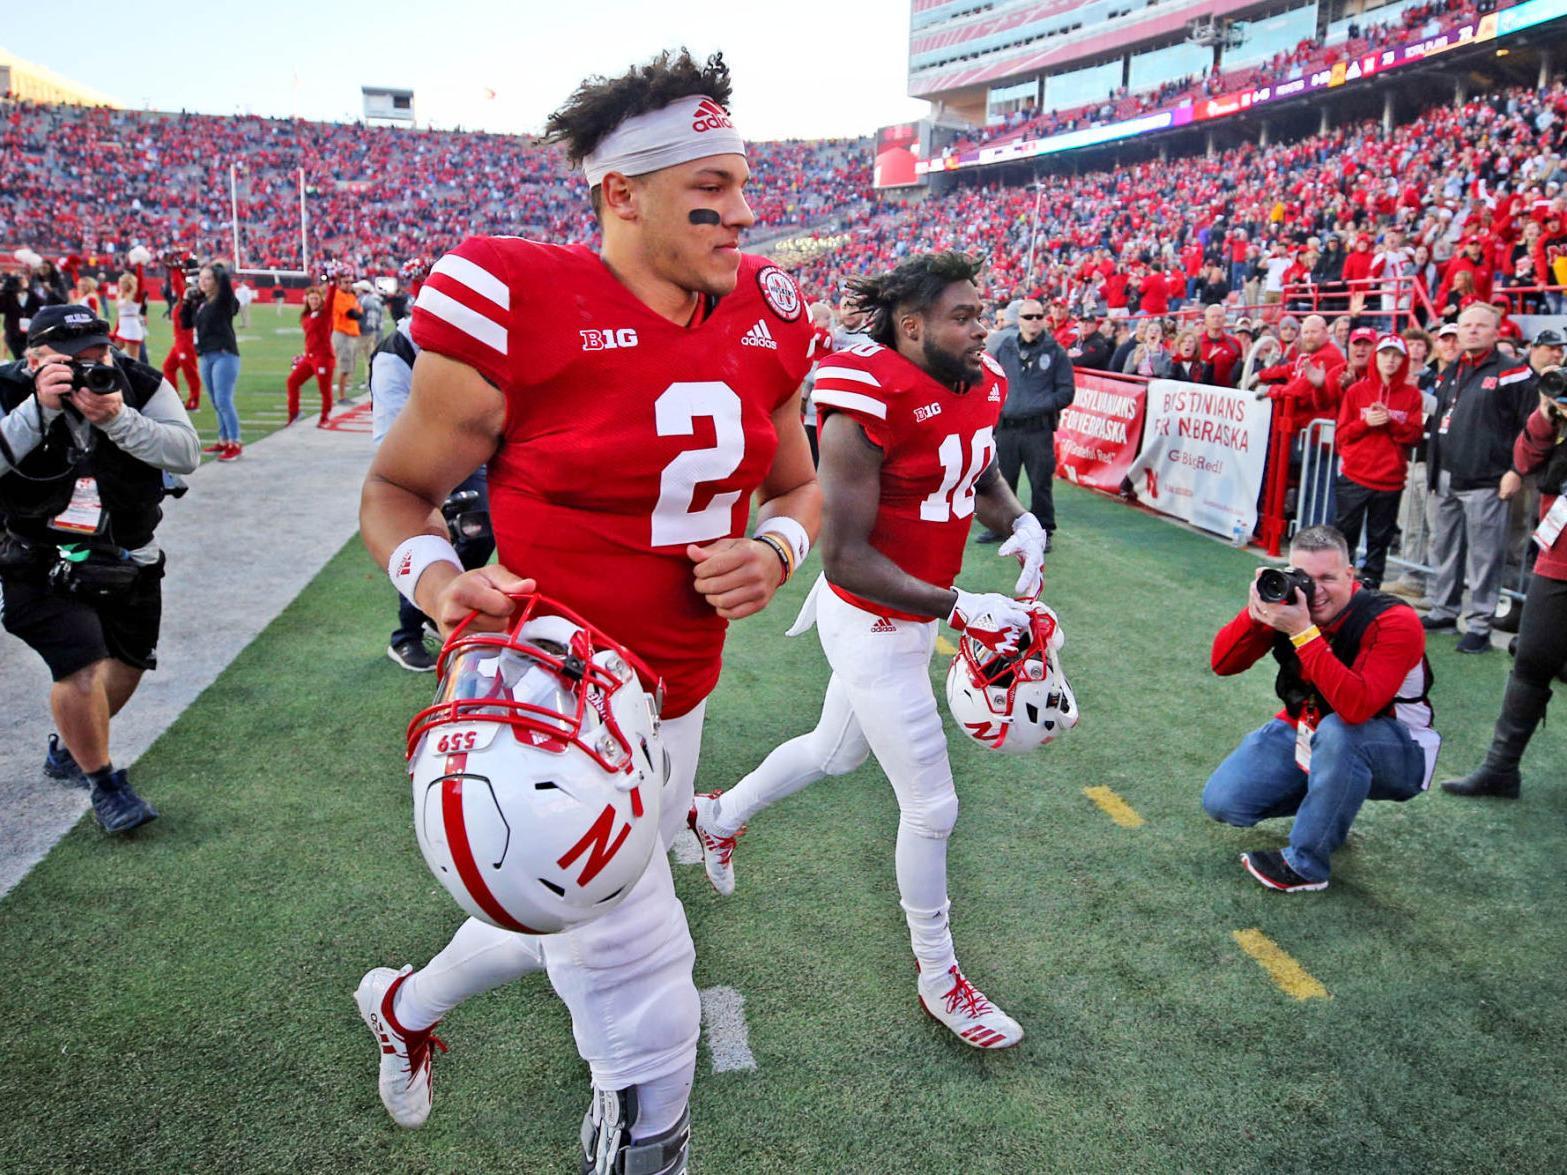 Iowa State-Texas Tech matchup to feature pair of promising freshman quarterbacks